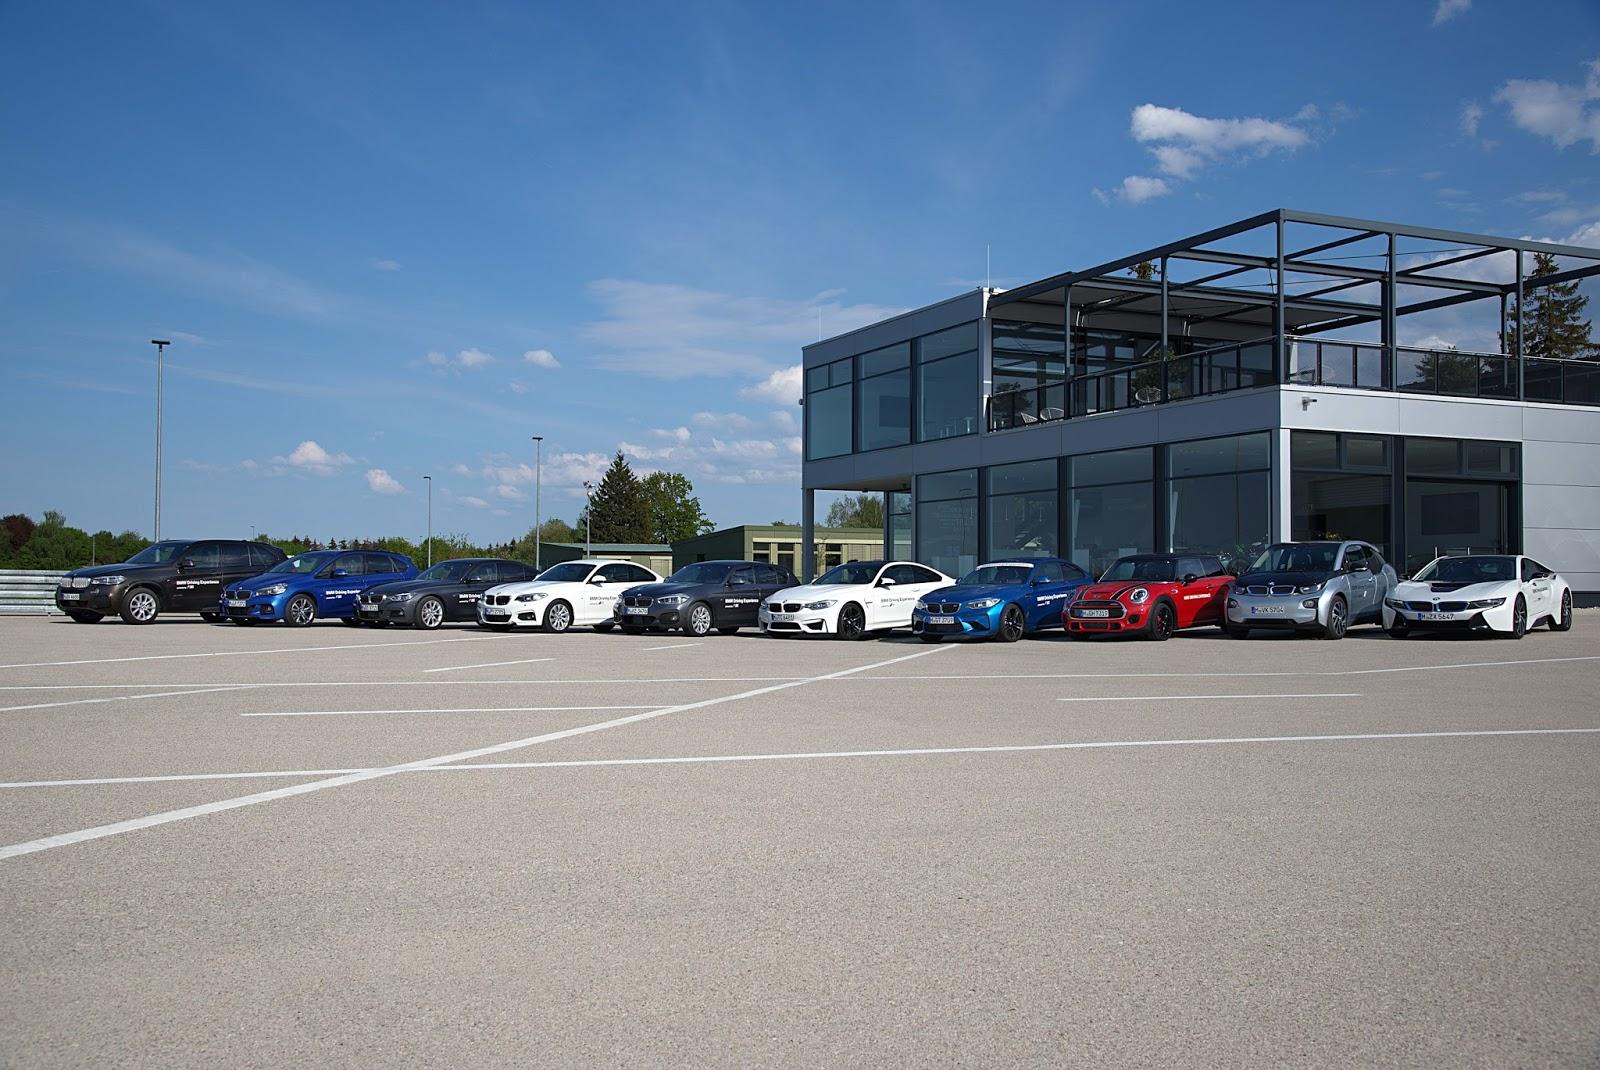 P90254194 highRes bmw mini driving ex 1 Γίνε καλύτερος οδηγός κάτω από όλες τις συνθήκες, με Bmw και Mini BMW, BMW i, BMW M, Driver, Driving Skills, Safety, οδήγηση, οδηγοί